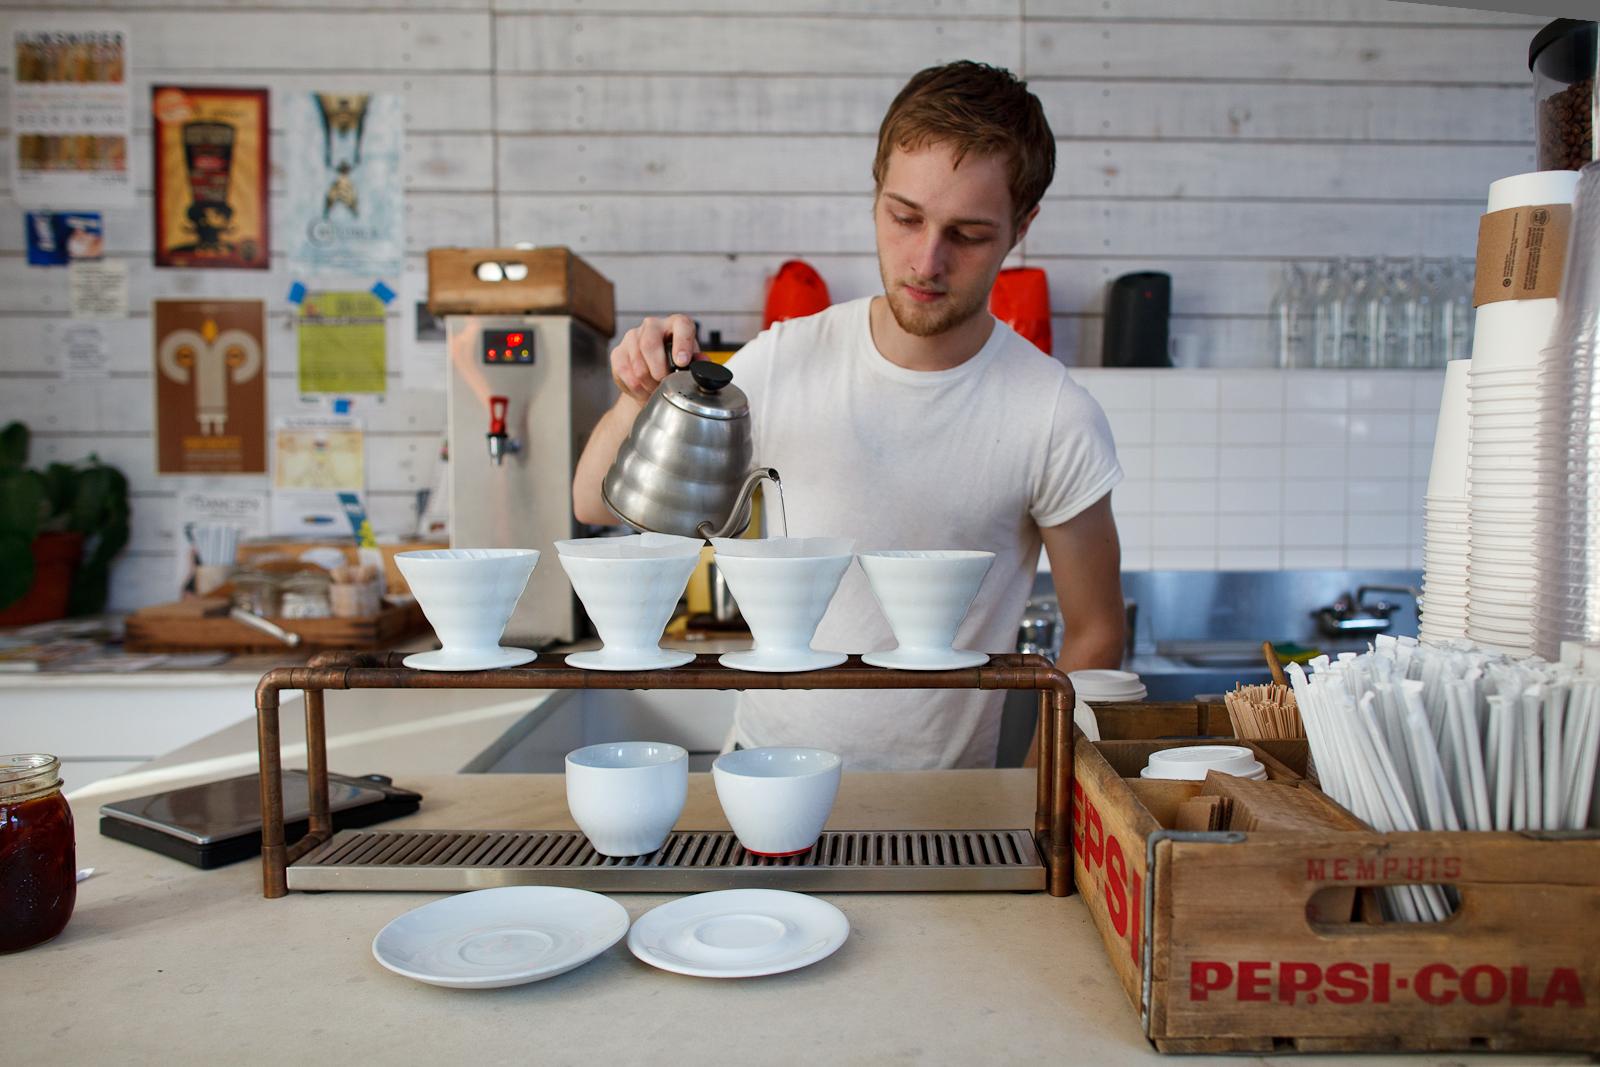 Pour over Intelligentsia coffee ($3.55)